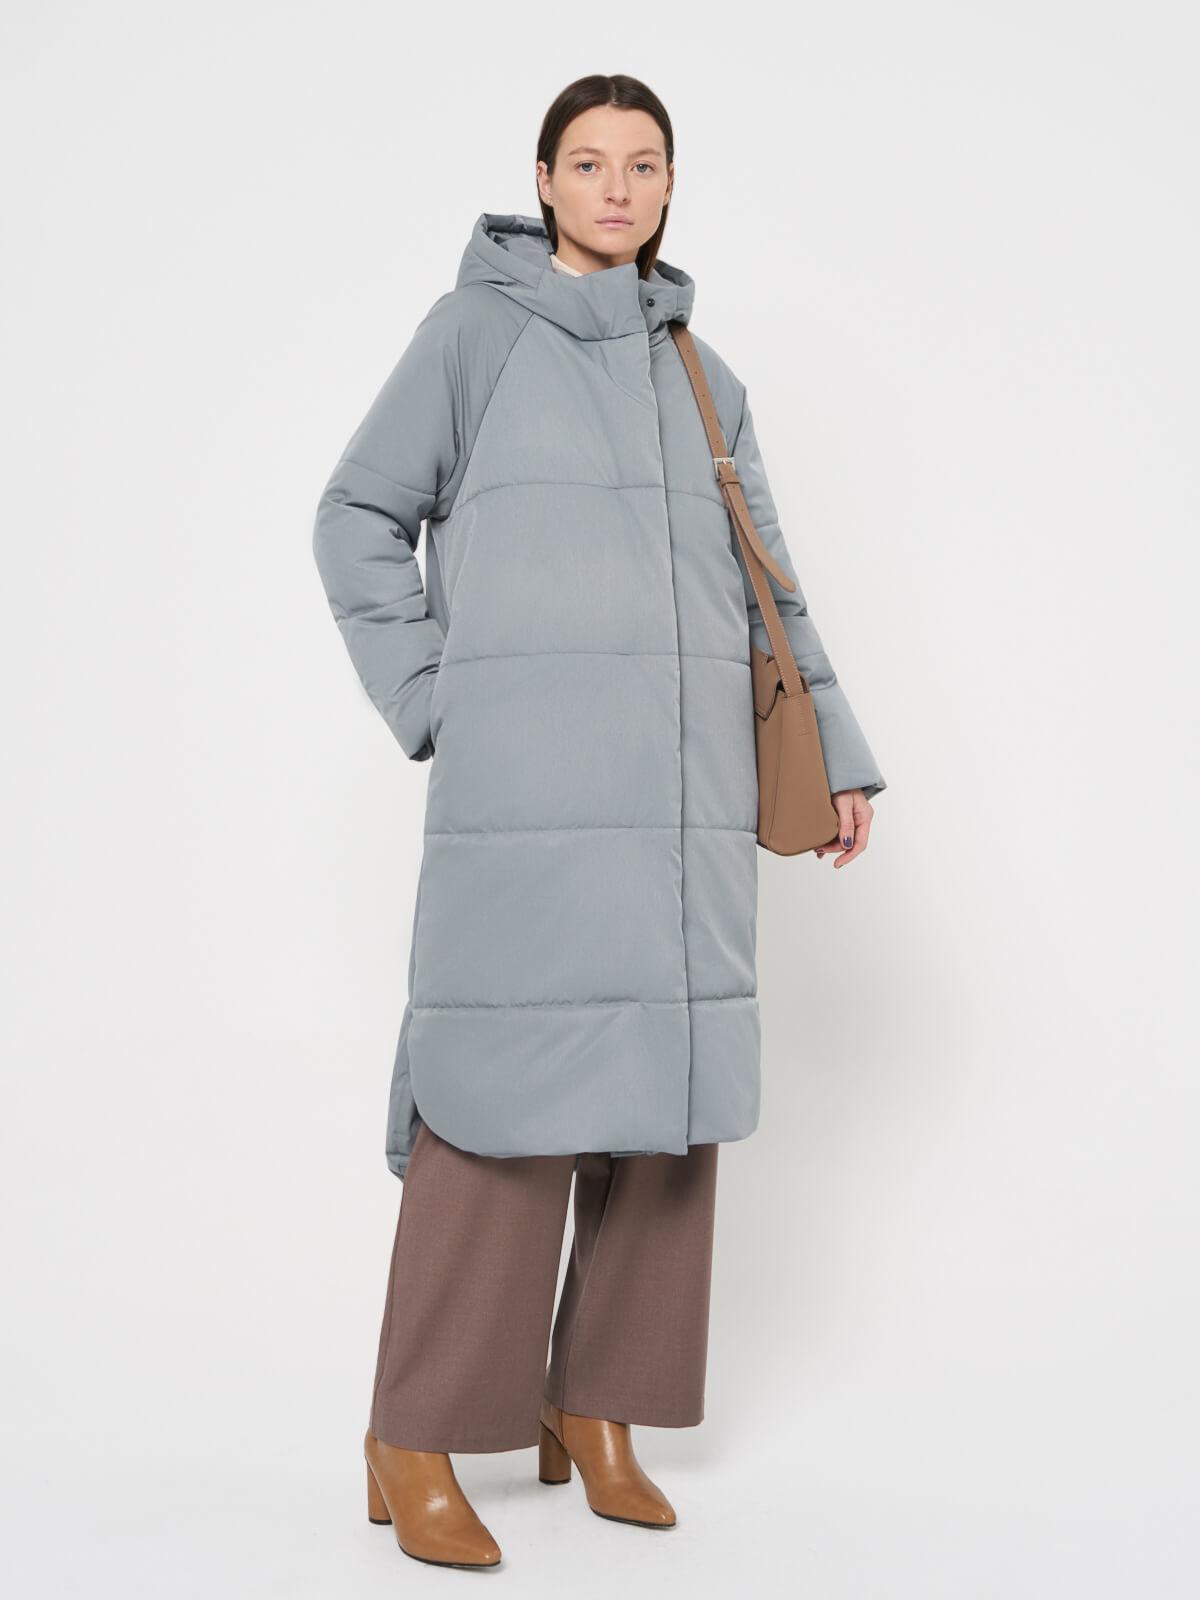 Куртка Санкт-Петербург